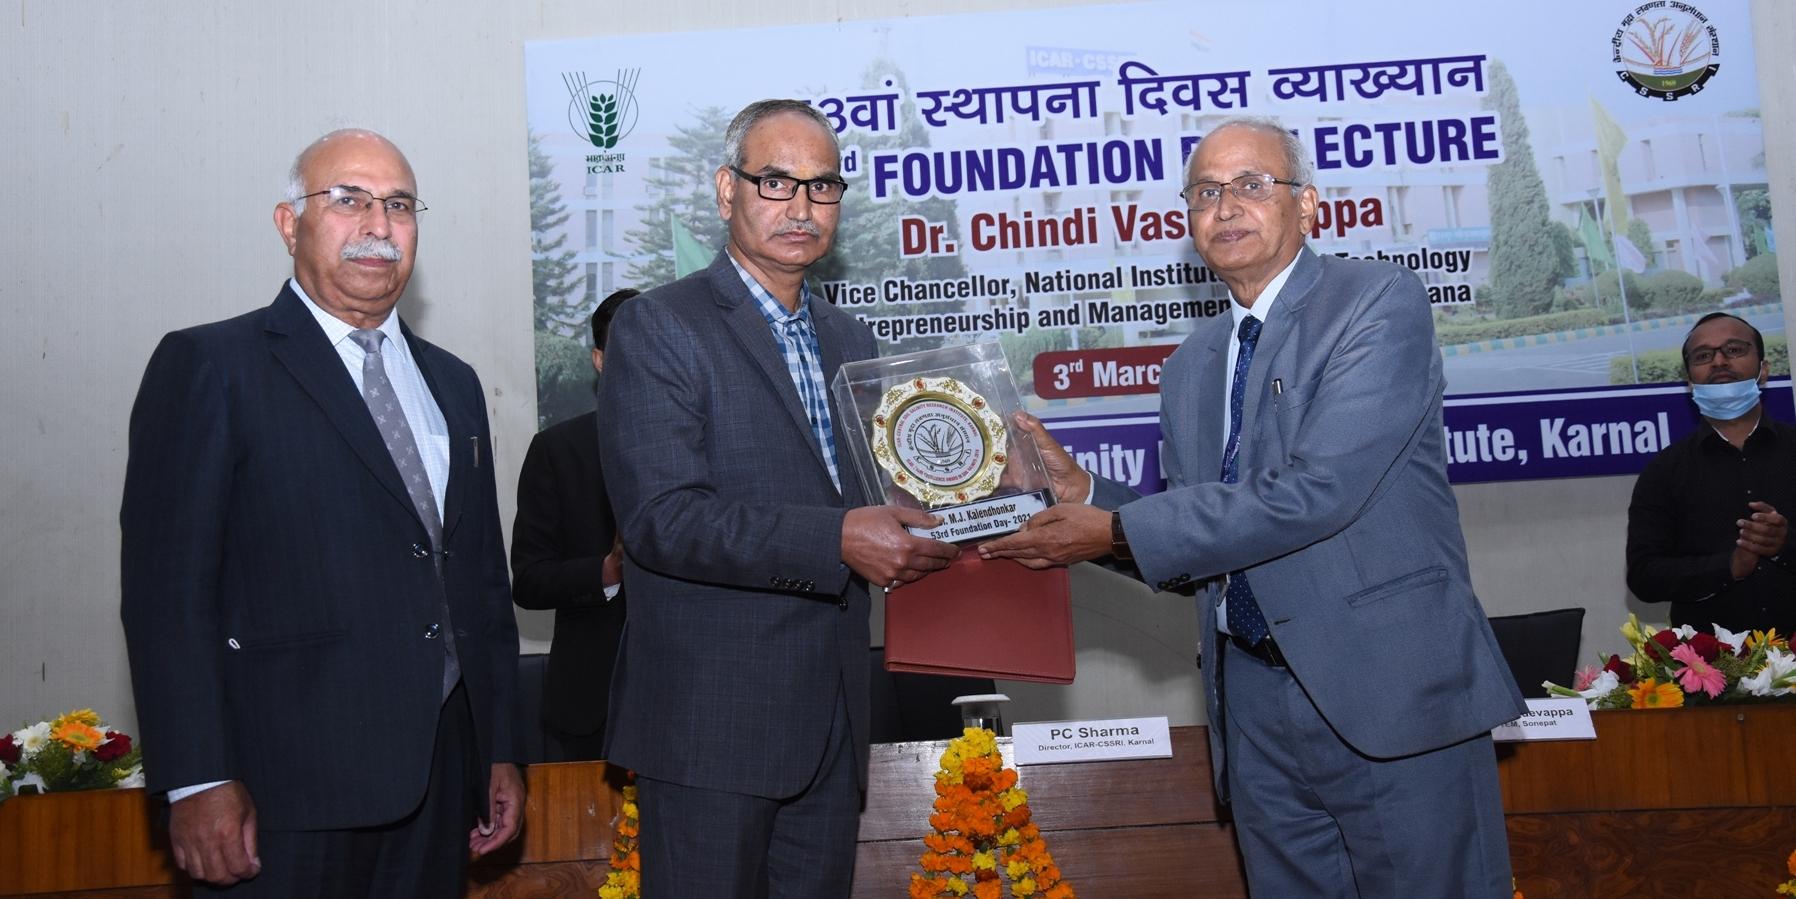 53rd Foundation Day of ICAR-CSSRI, Karnal